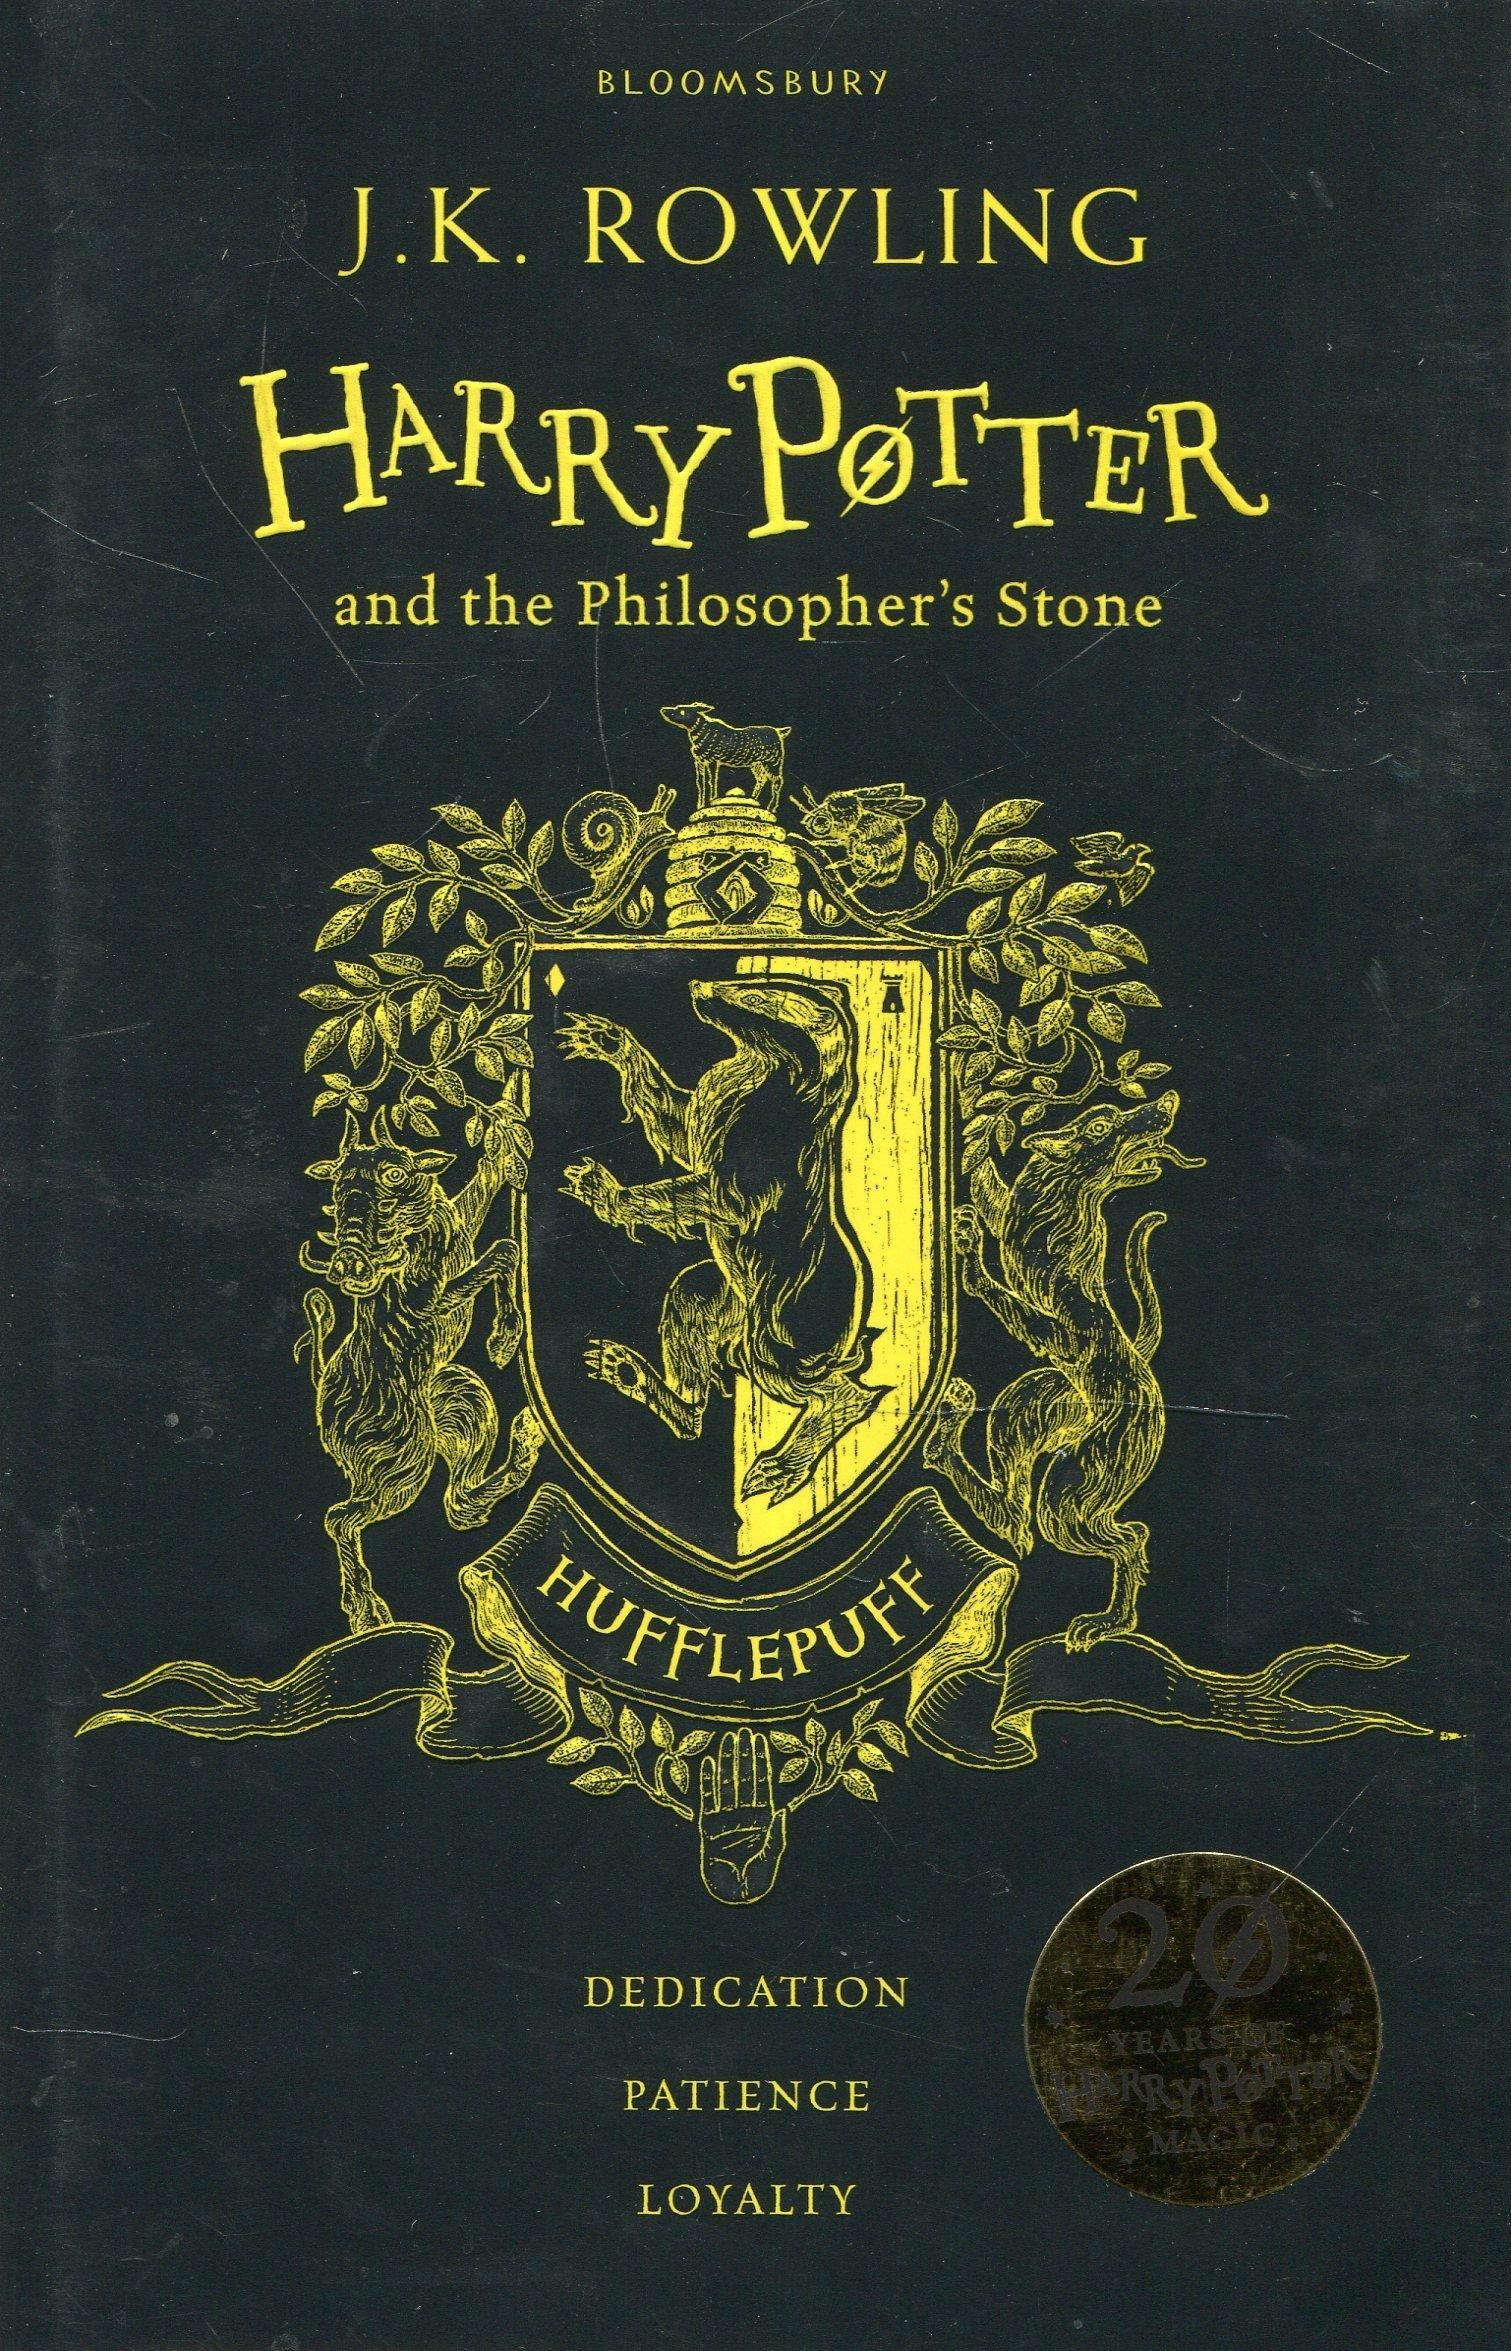 Harry Potter and the Philosopher's Stone – Hufflepuff Edition (Inglese) Cartonato – 1 giu 2017 J.K. Rowling 1408883805 FICTION / Fantasy / General 7-11 ans